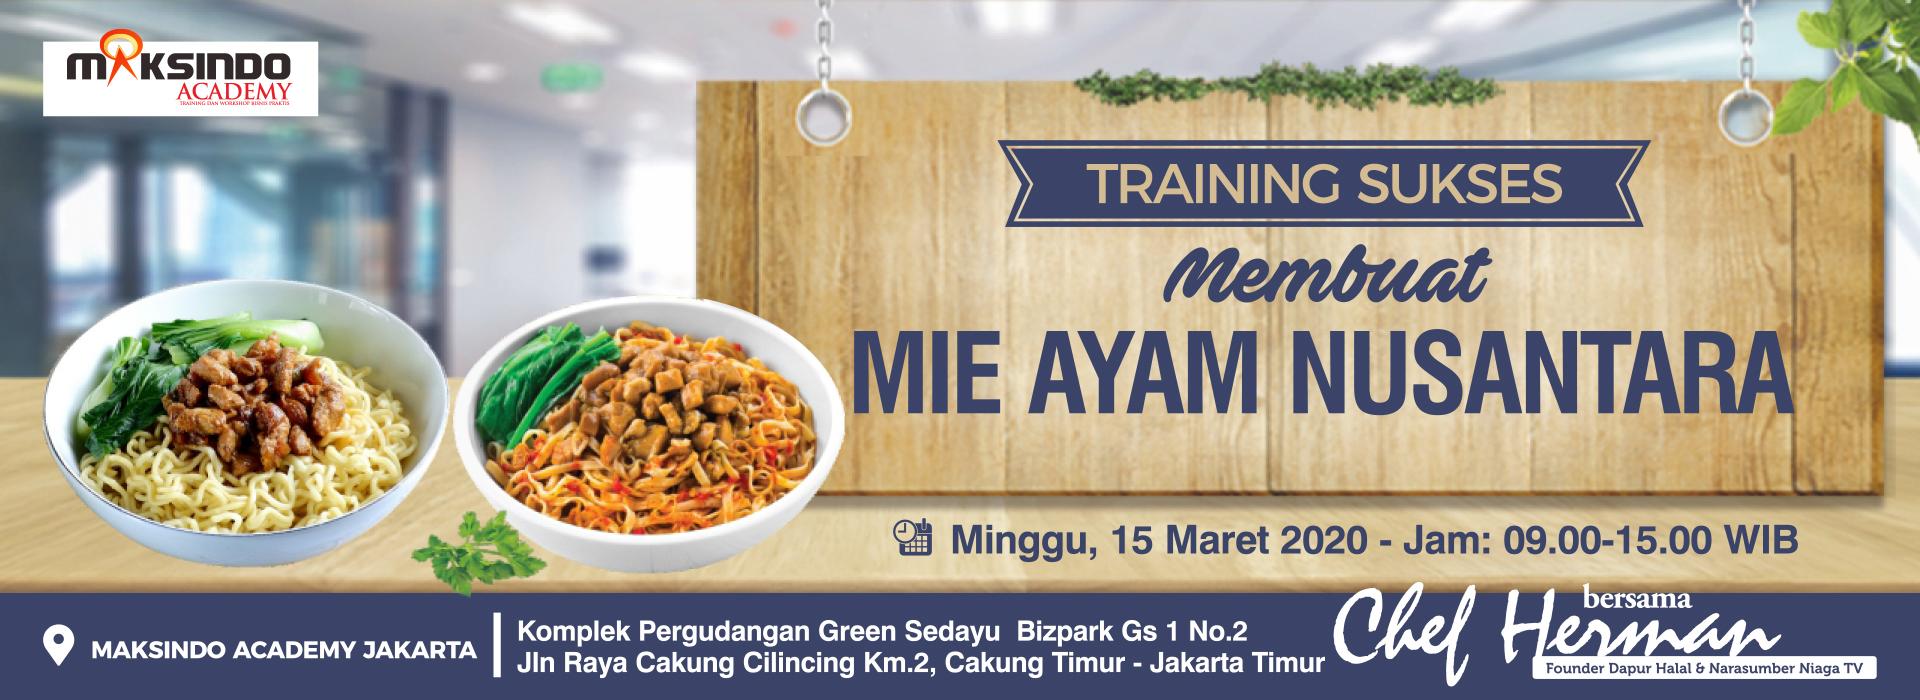 Toko Mesin Maksindo Semarang 3